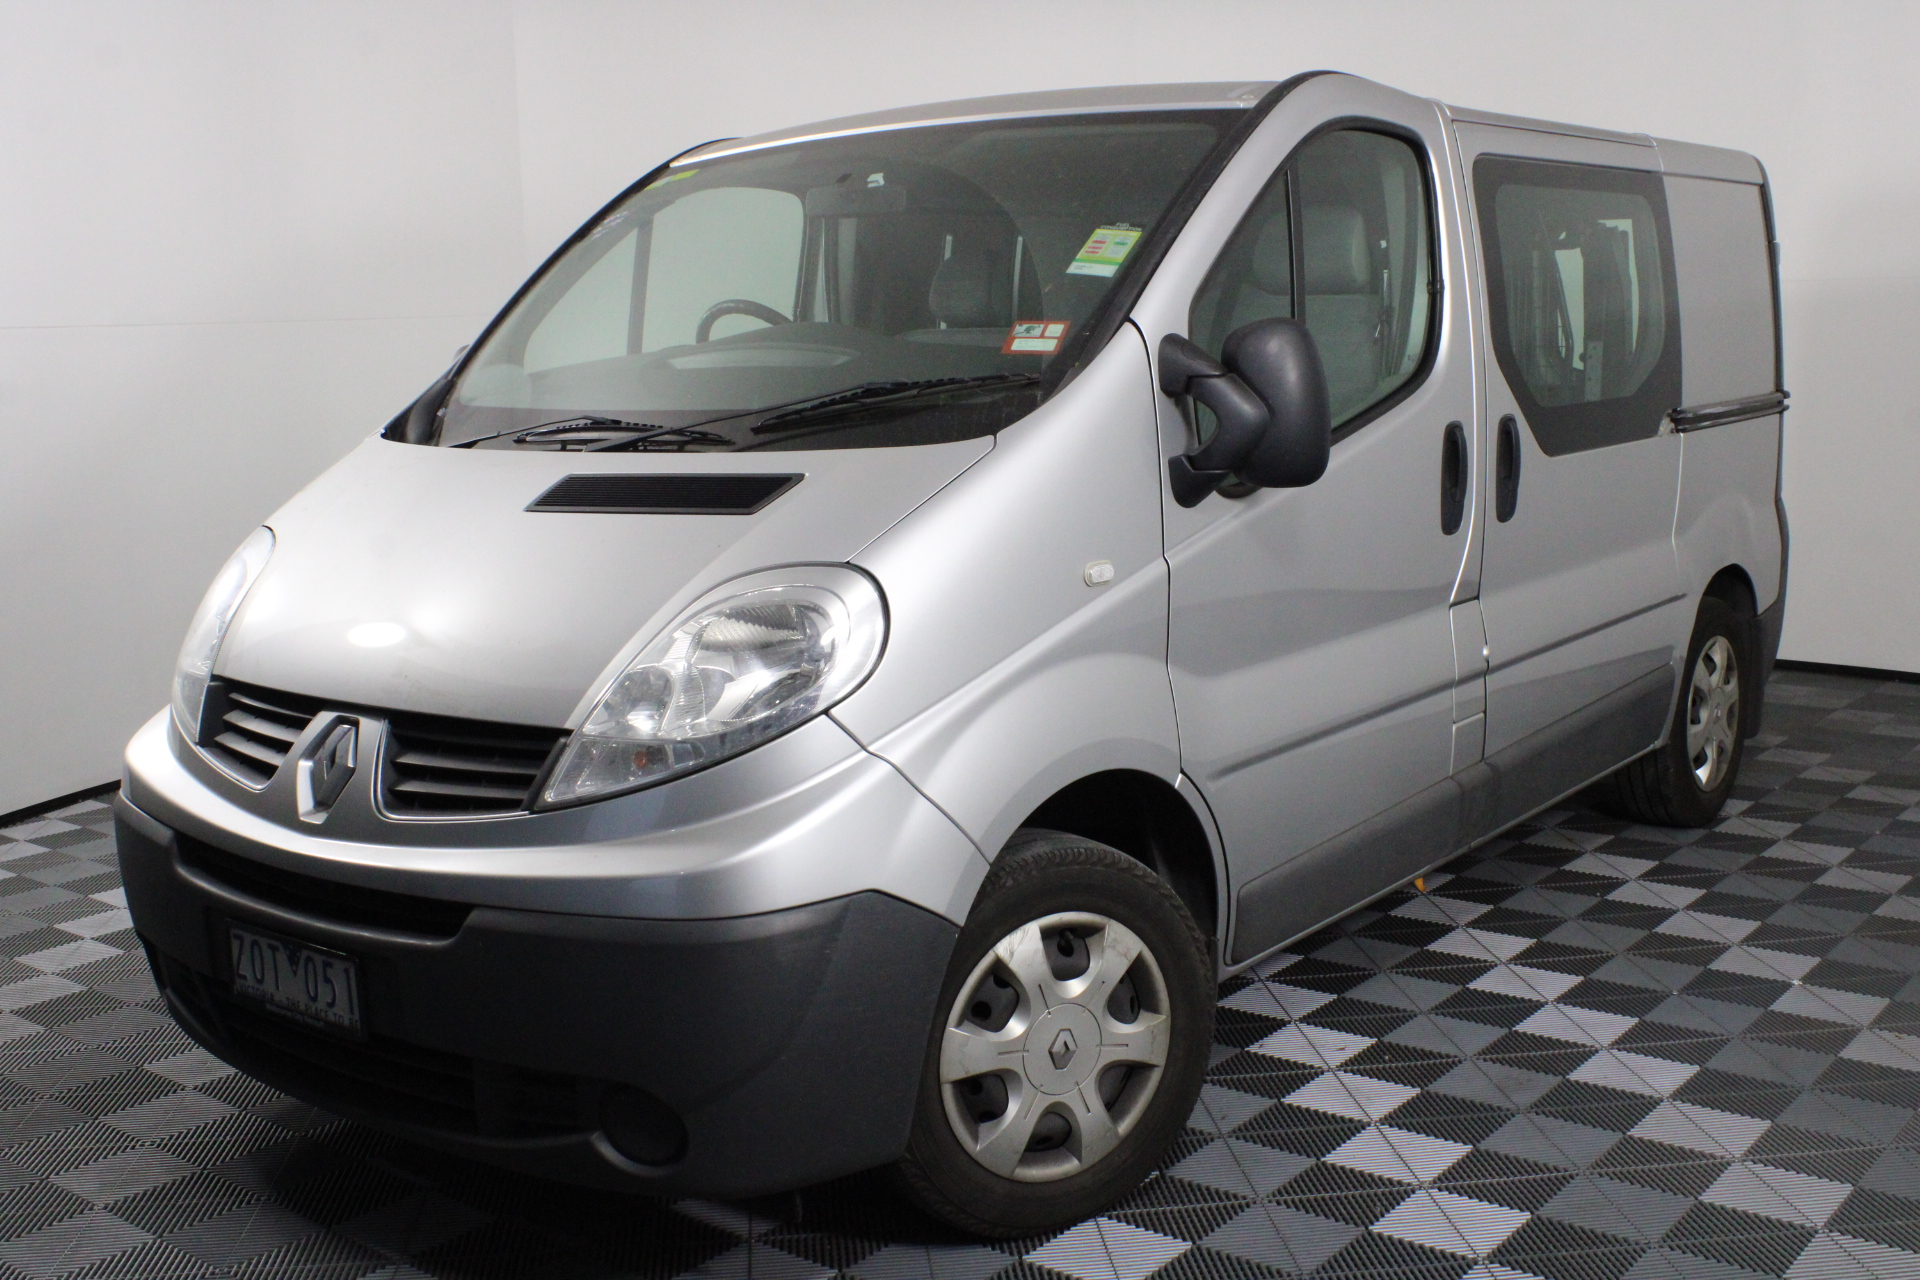 2012 Renault Trafic 2.0 dCi SWB Turbo Diesel Semi Auto Van